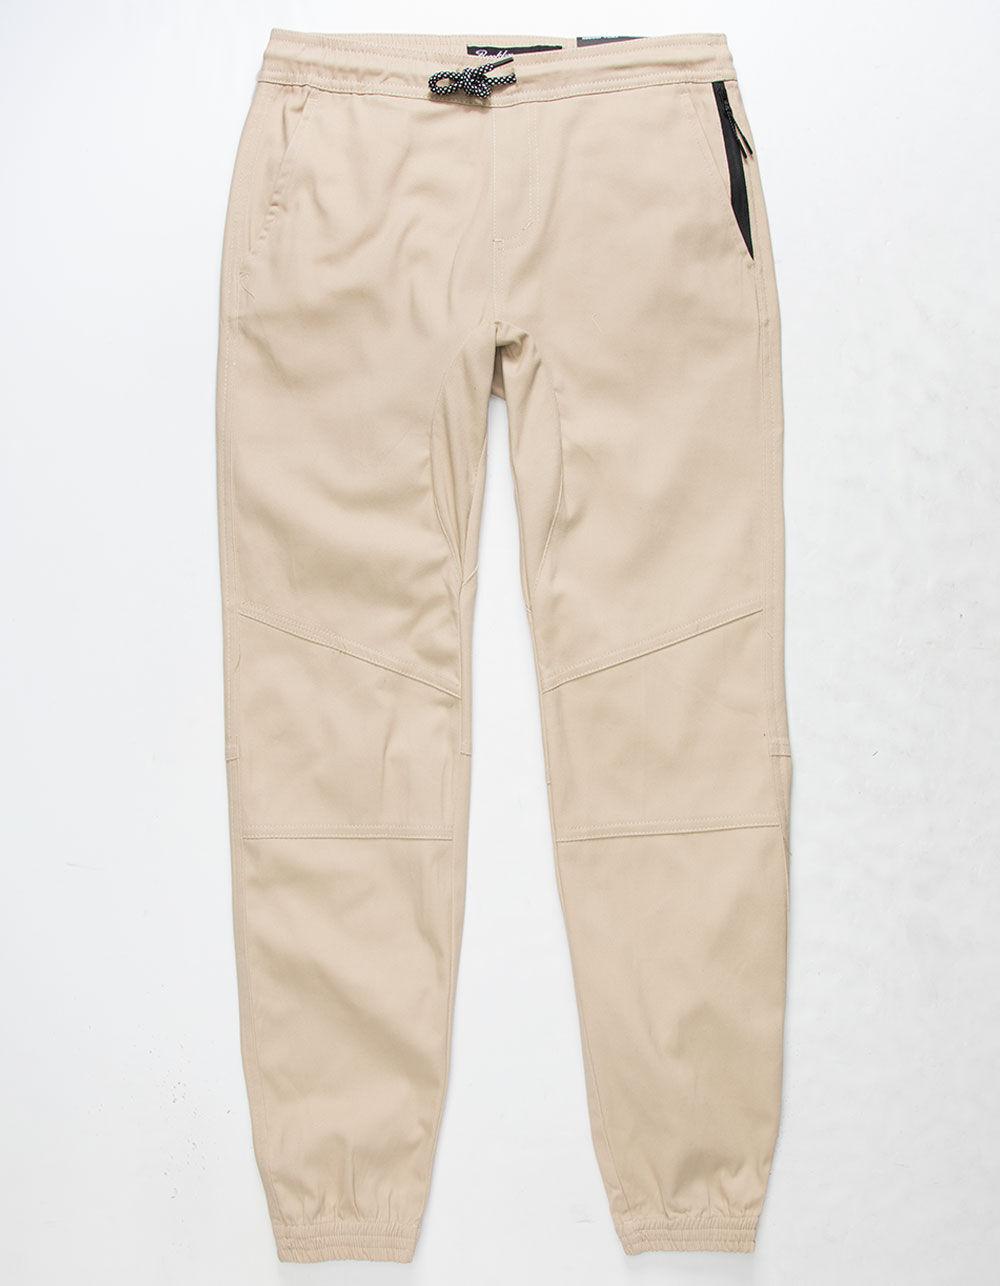 Image of BROOKLYN CLOTH TWILL ZIP POCKET BOYS JOGGER PANTS